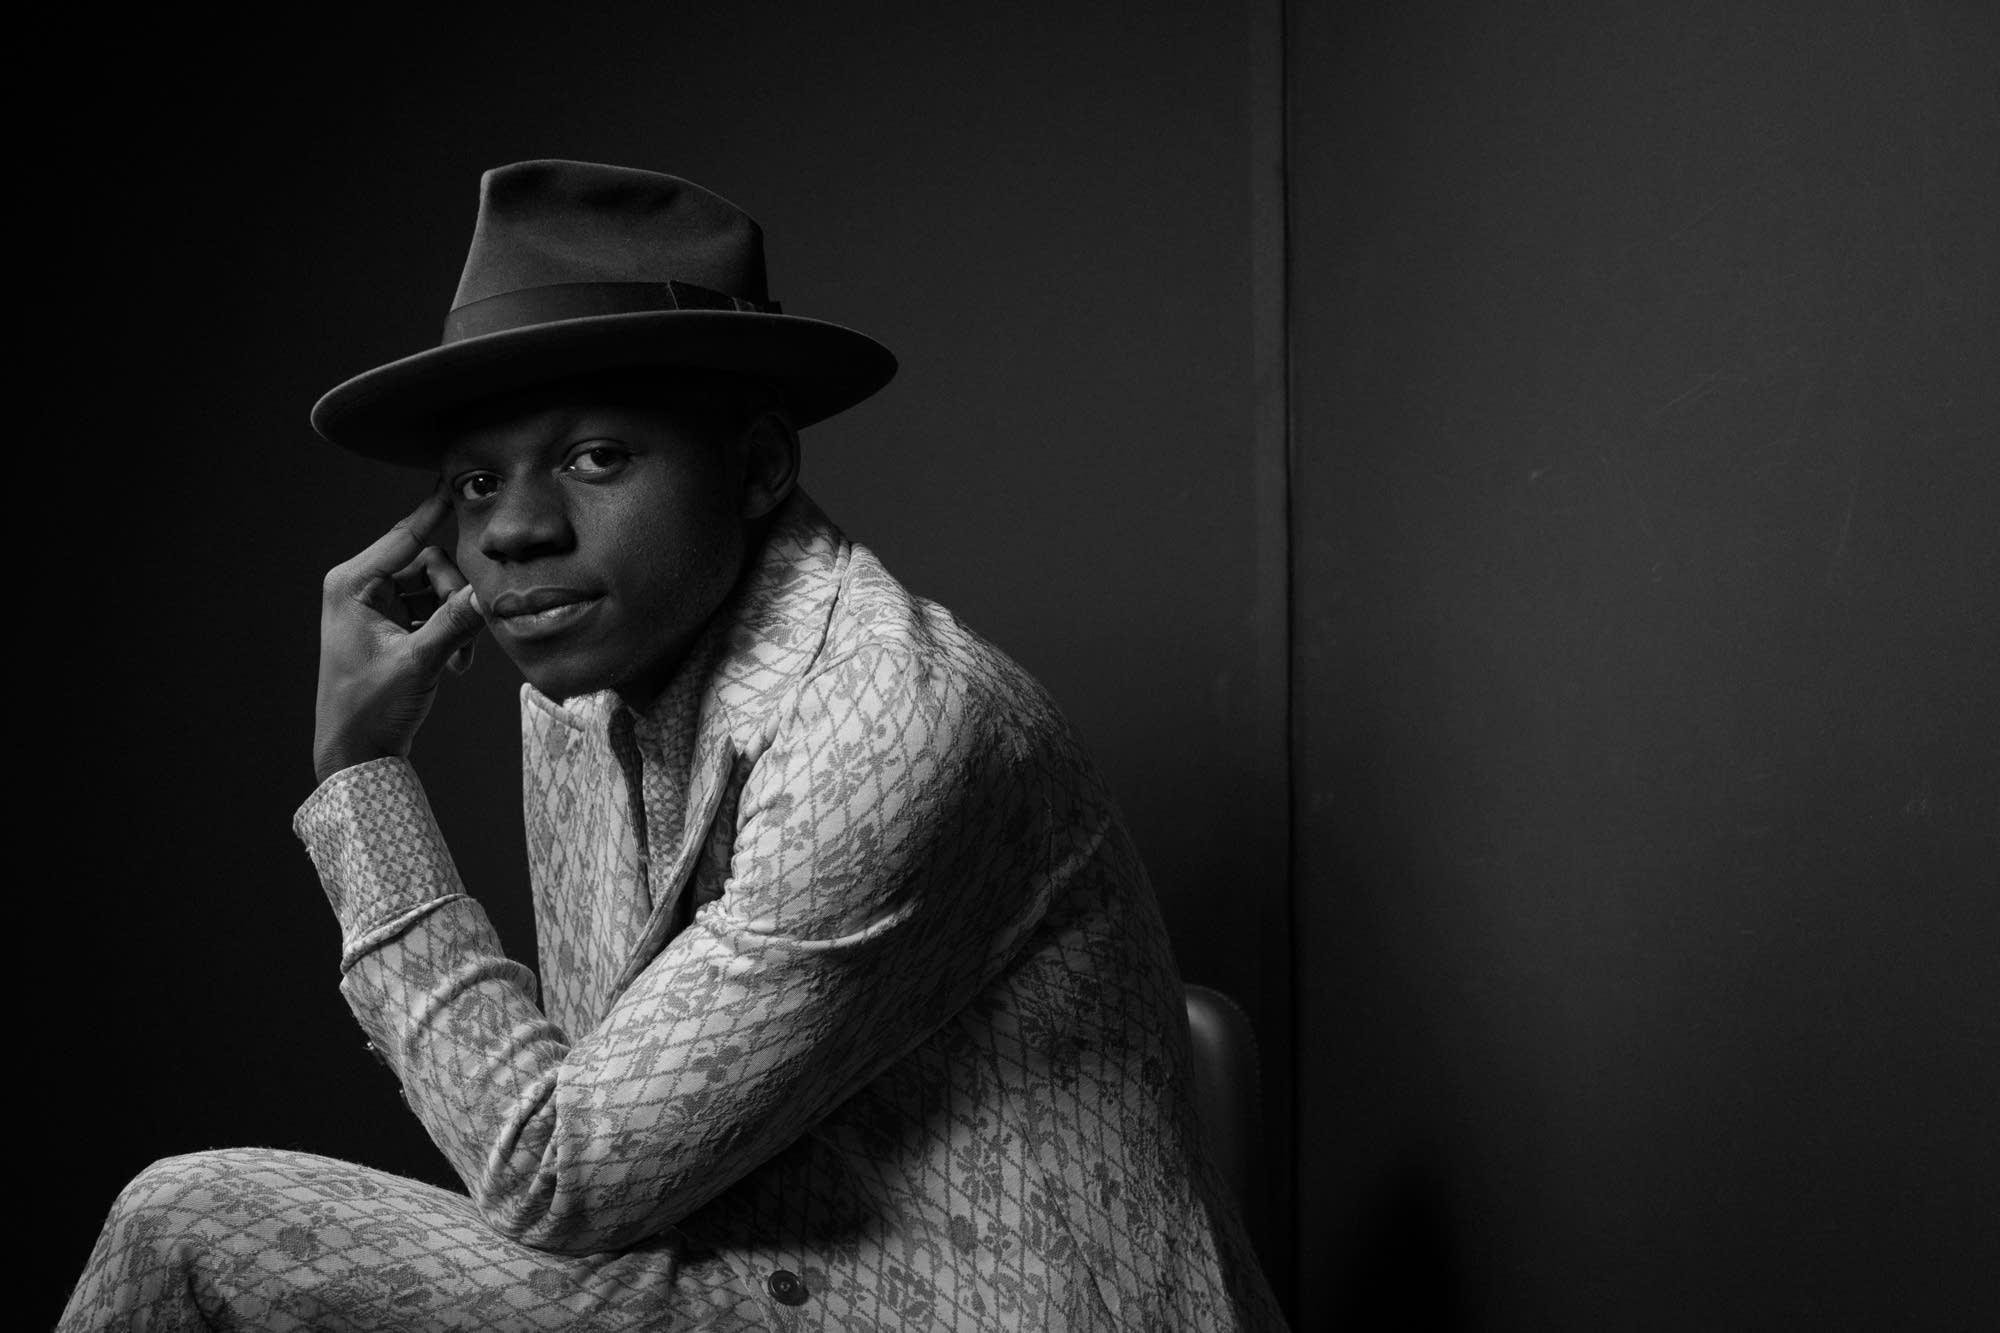 J.S. Ondara portrait 2019